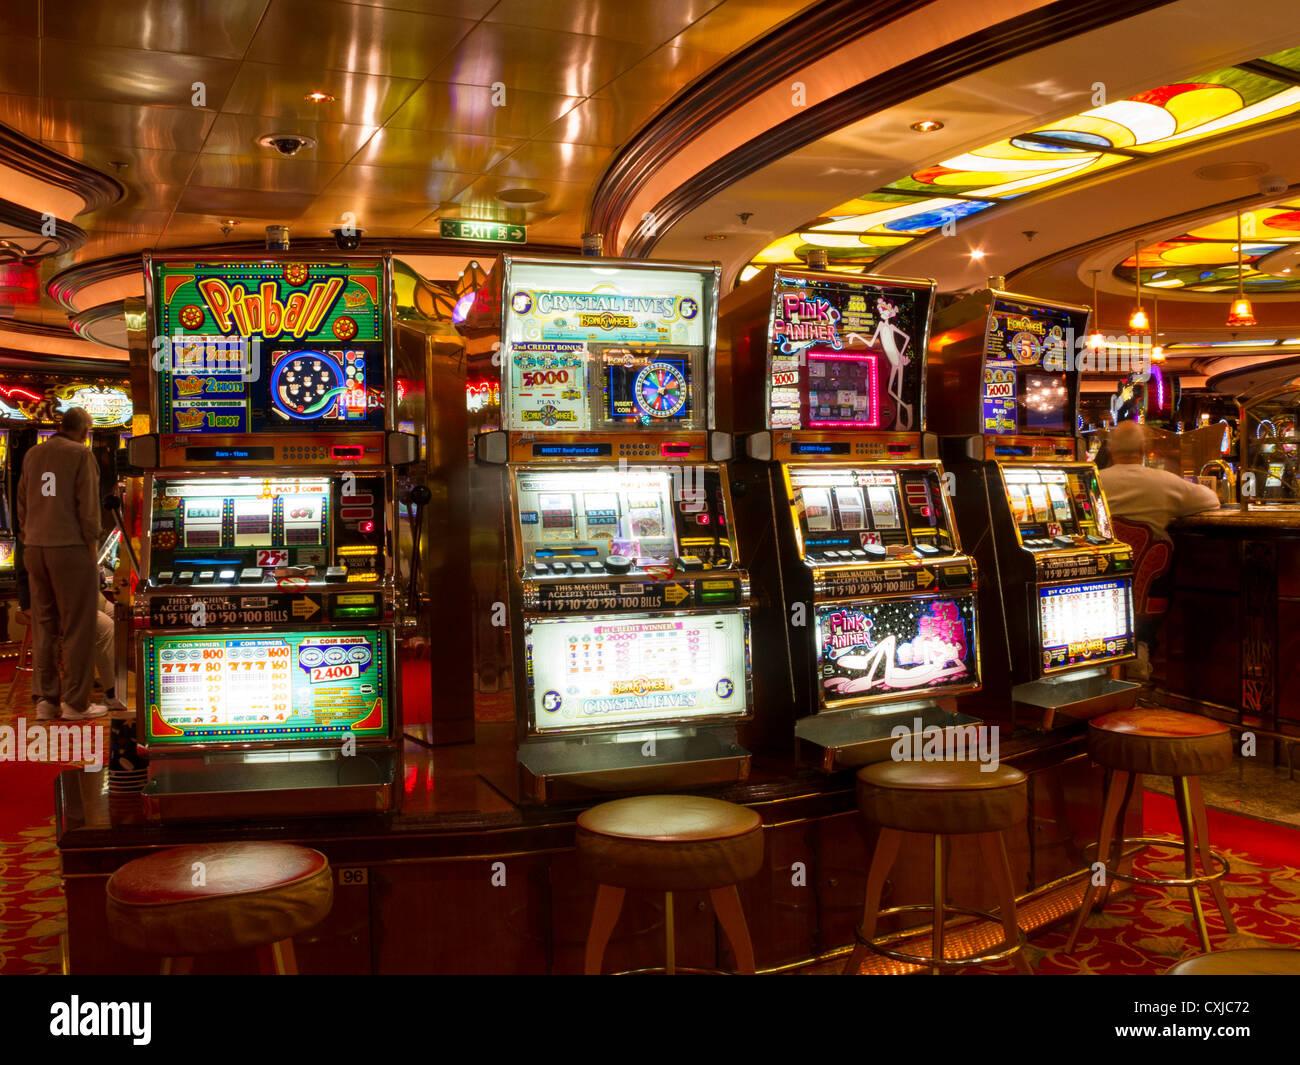 Electronic slots machines